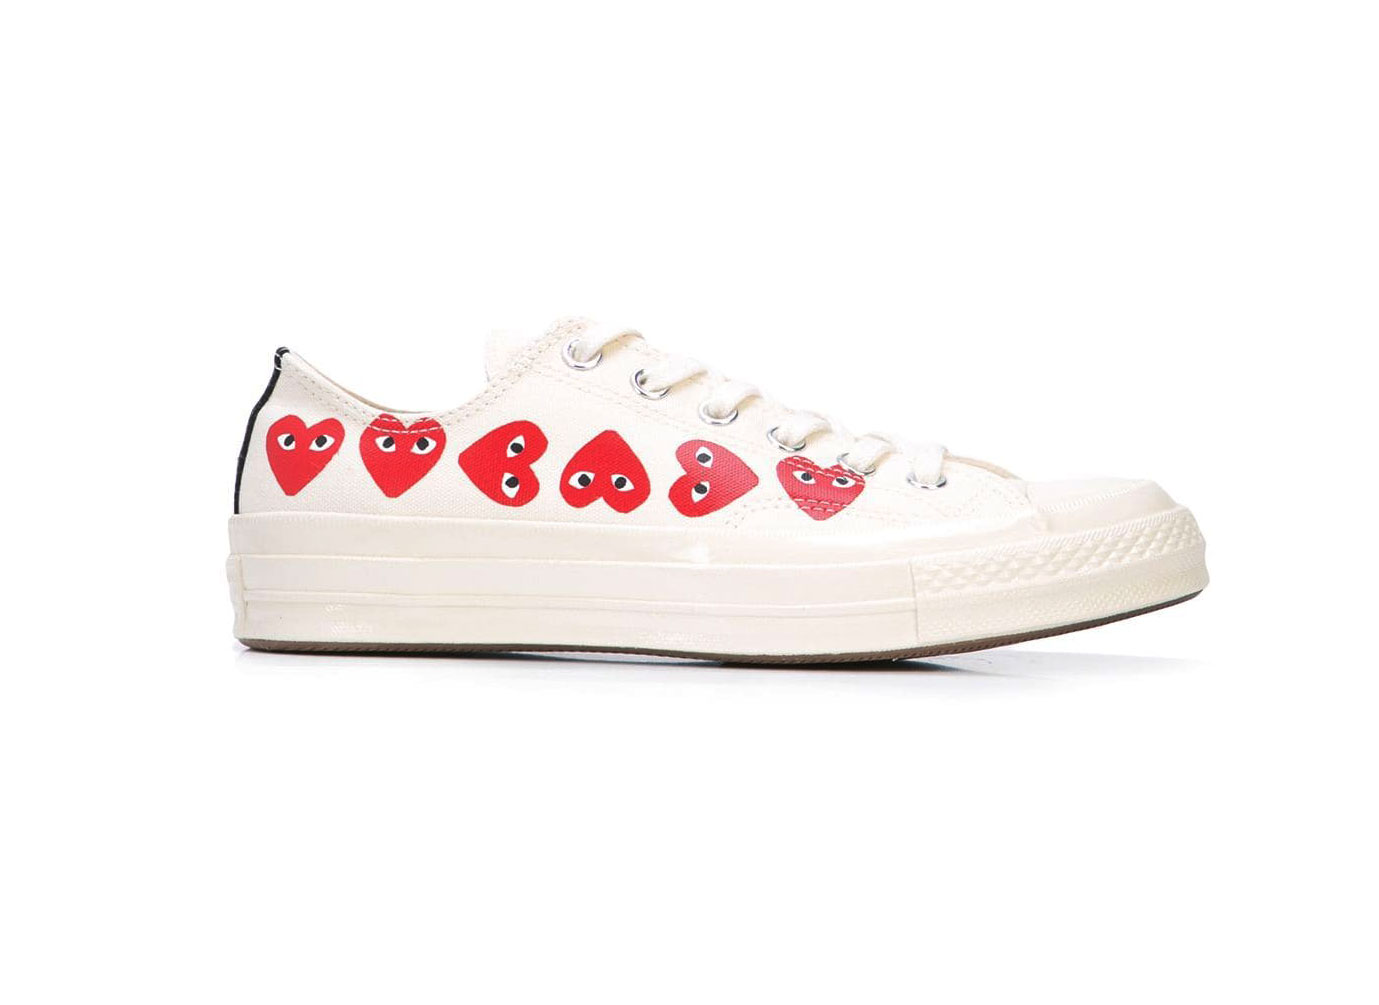 COMME DES GARÇONS PLAY x Converse Chuck Taylor Multi Heart 1970s Ox Sneakerss